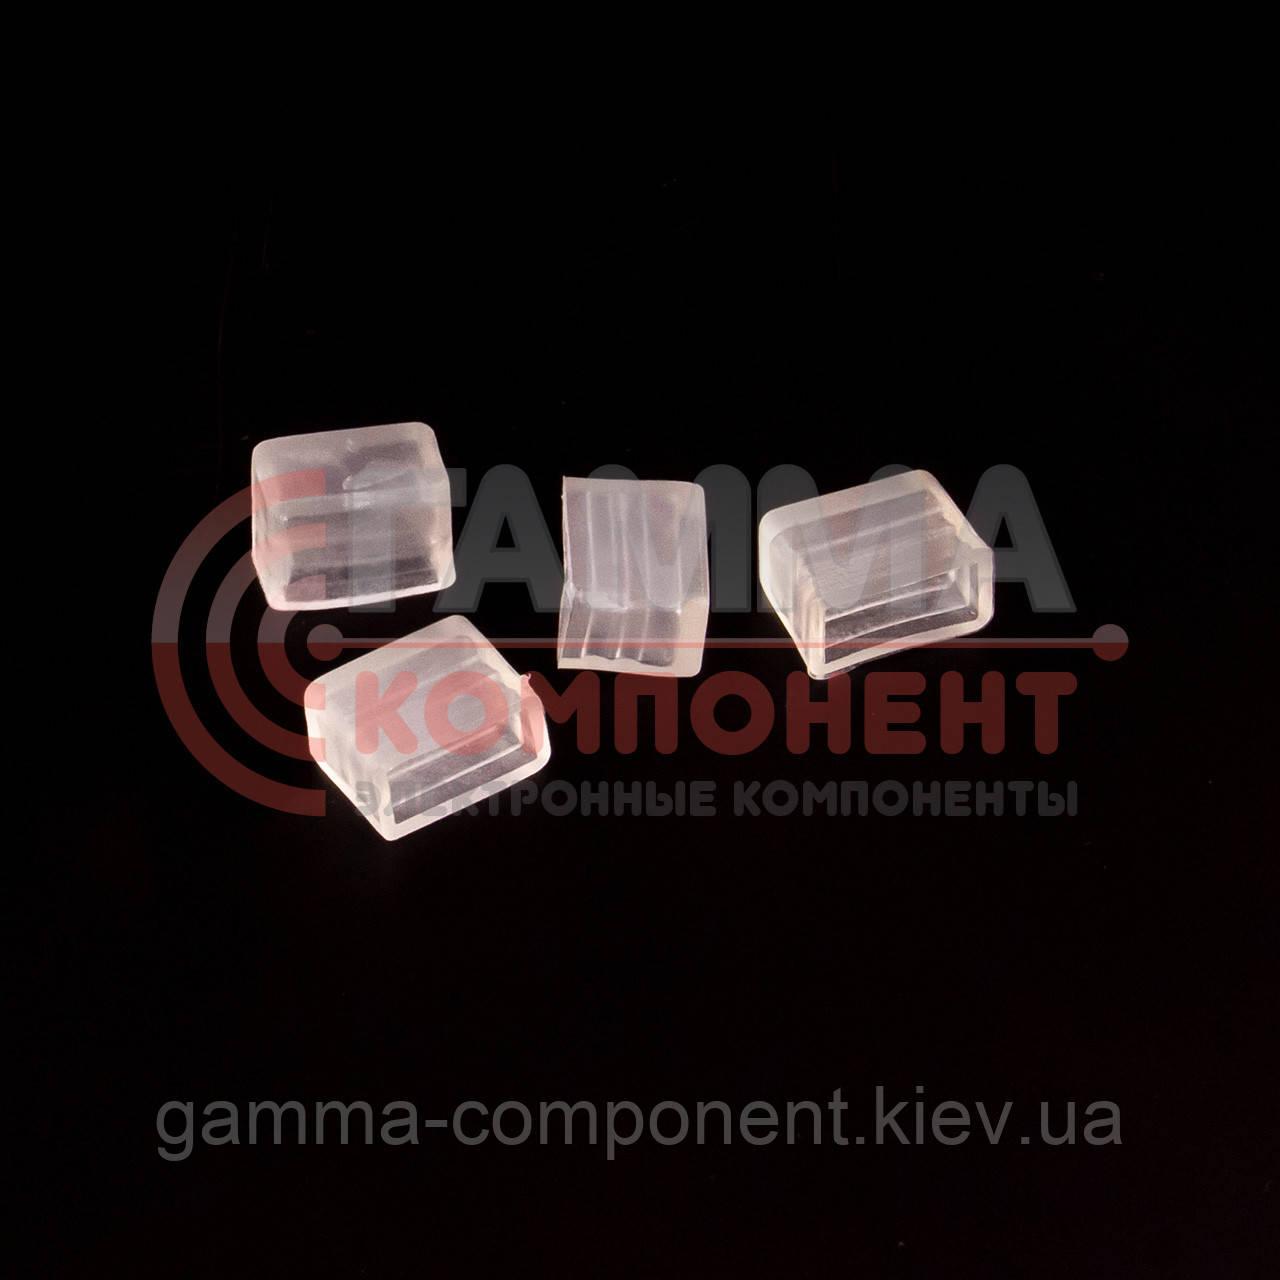 Заглушка для светодиодной ленты 220B RGB smd 5050-60 лед/м